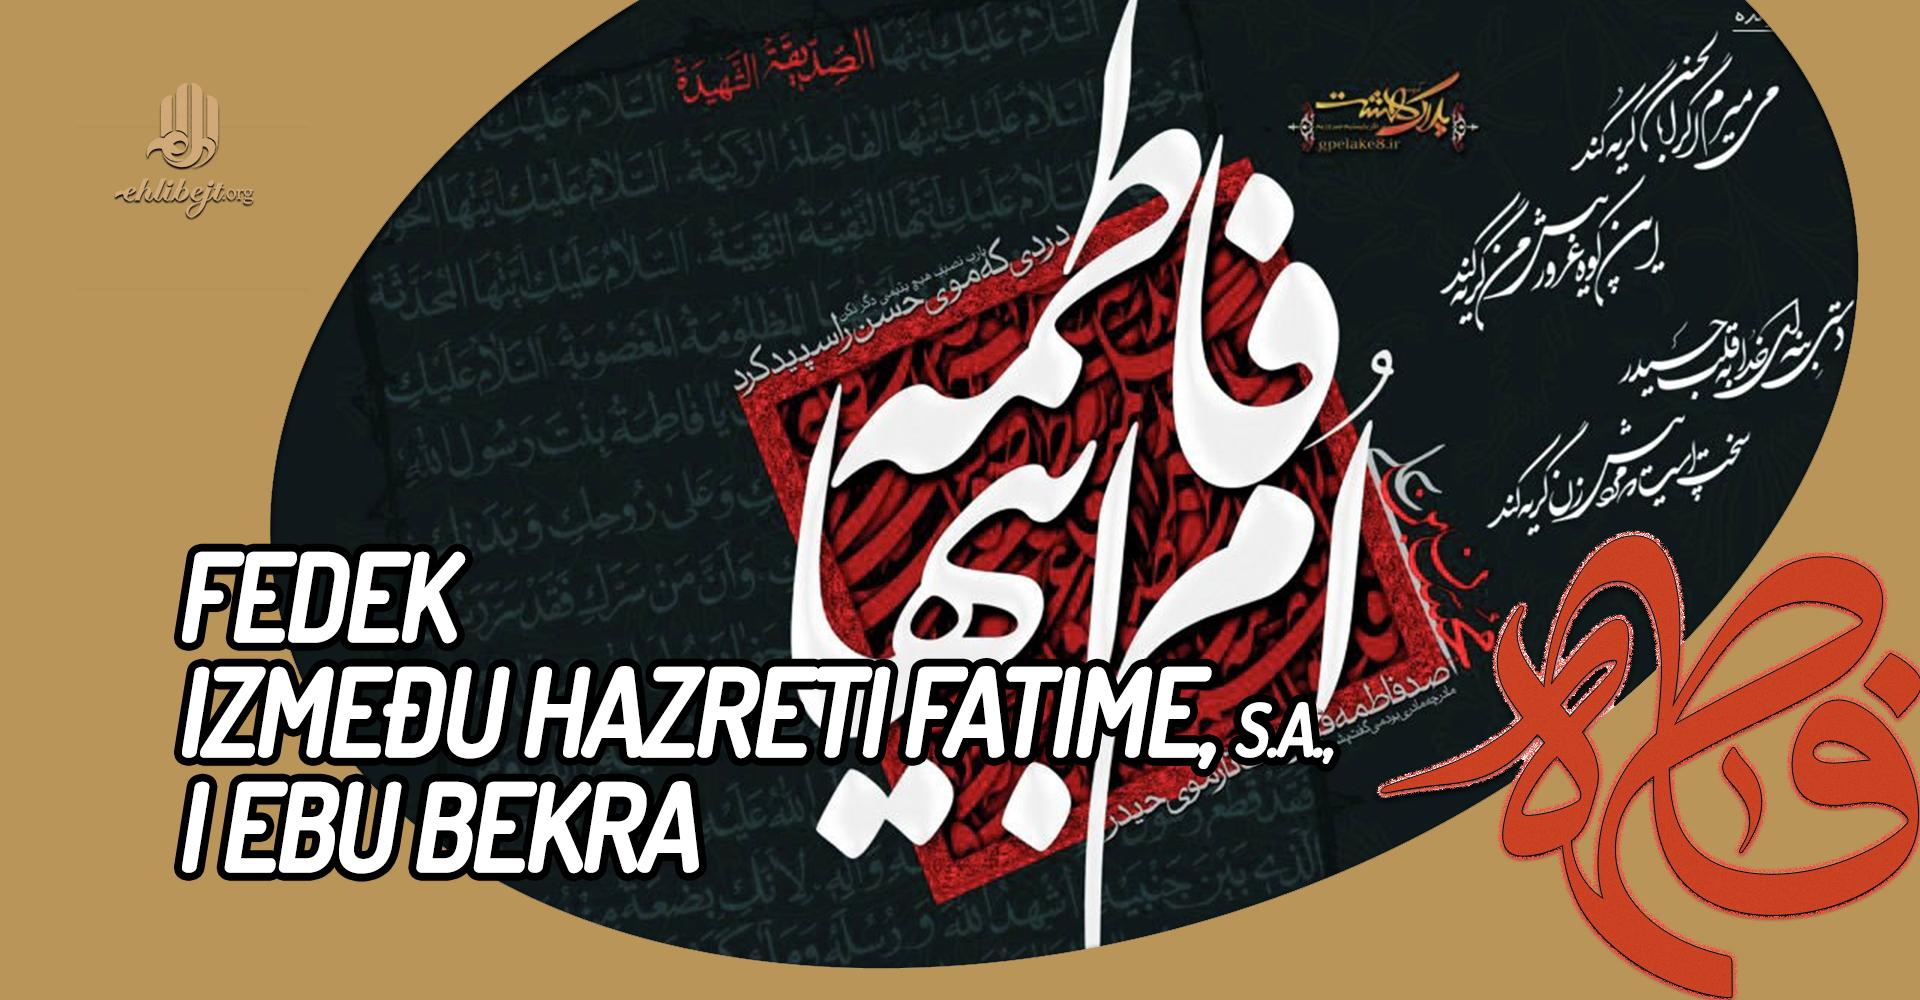 Fedek između hazreti Fatime, s.a., i Ebu Bekra